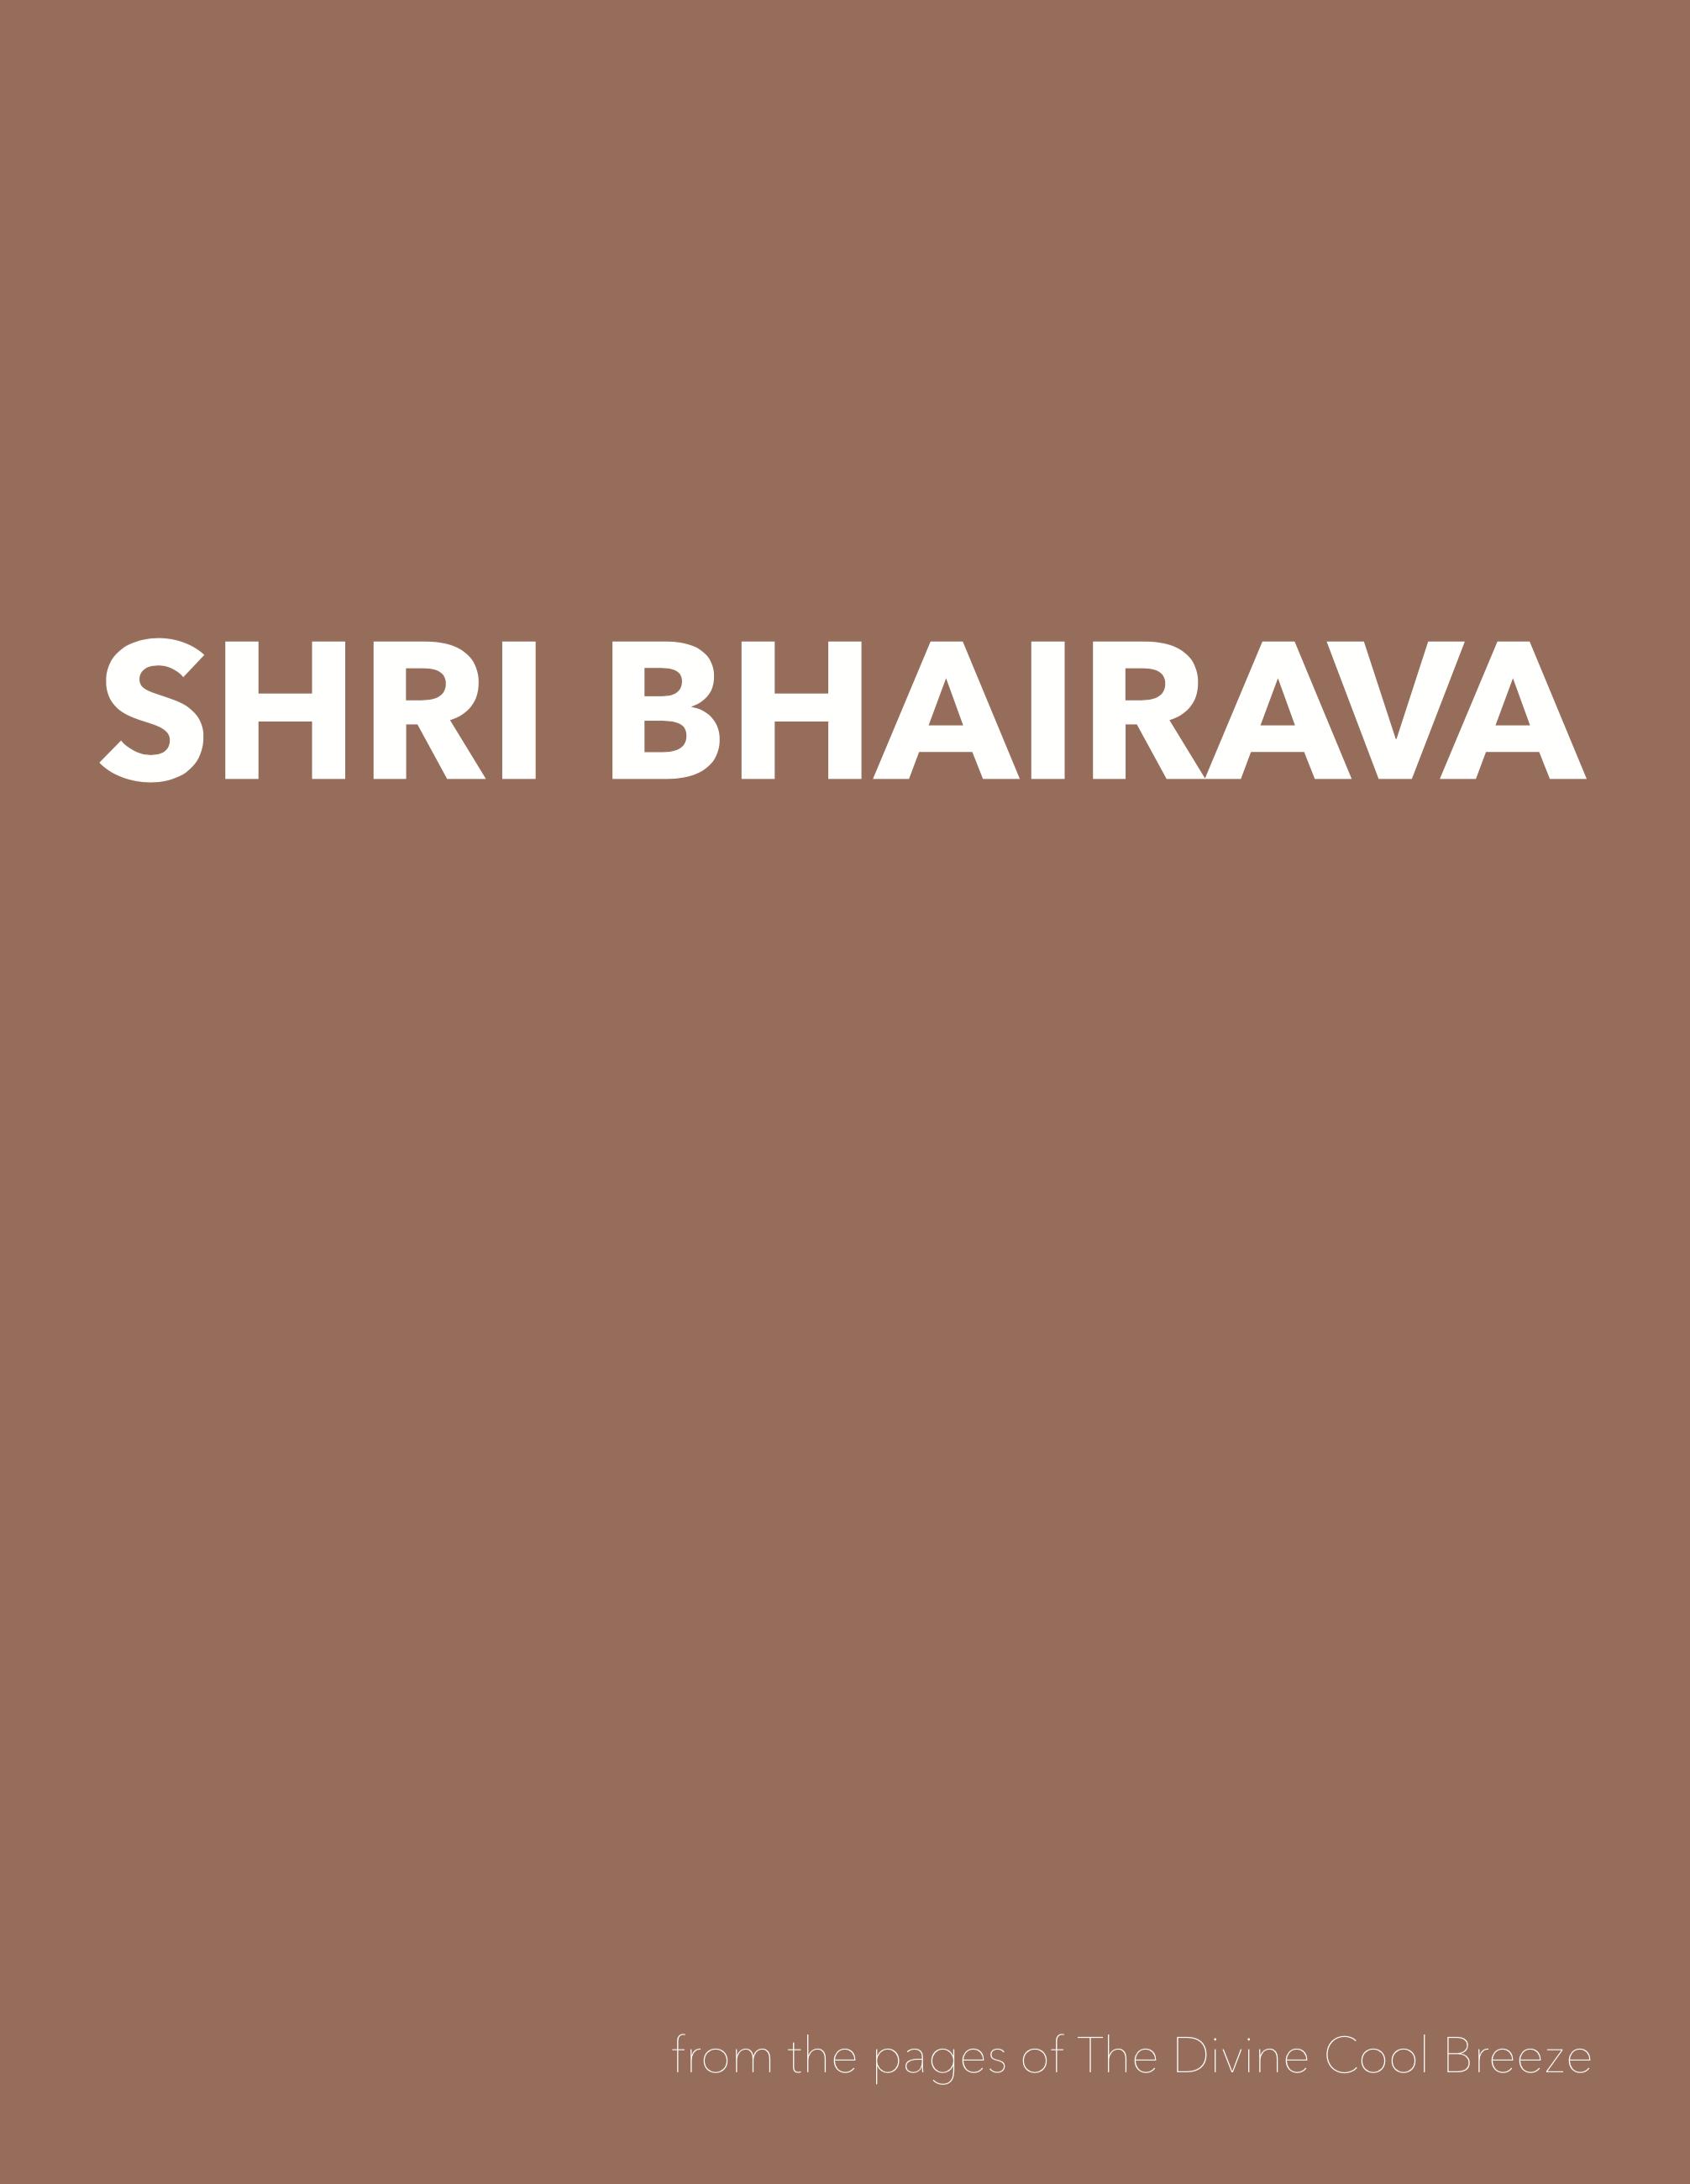 SHRI BHAIRAVA